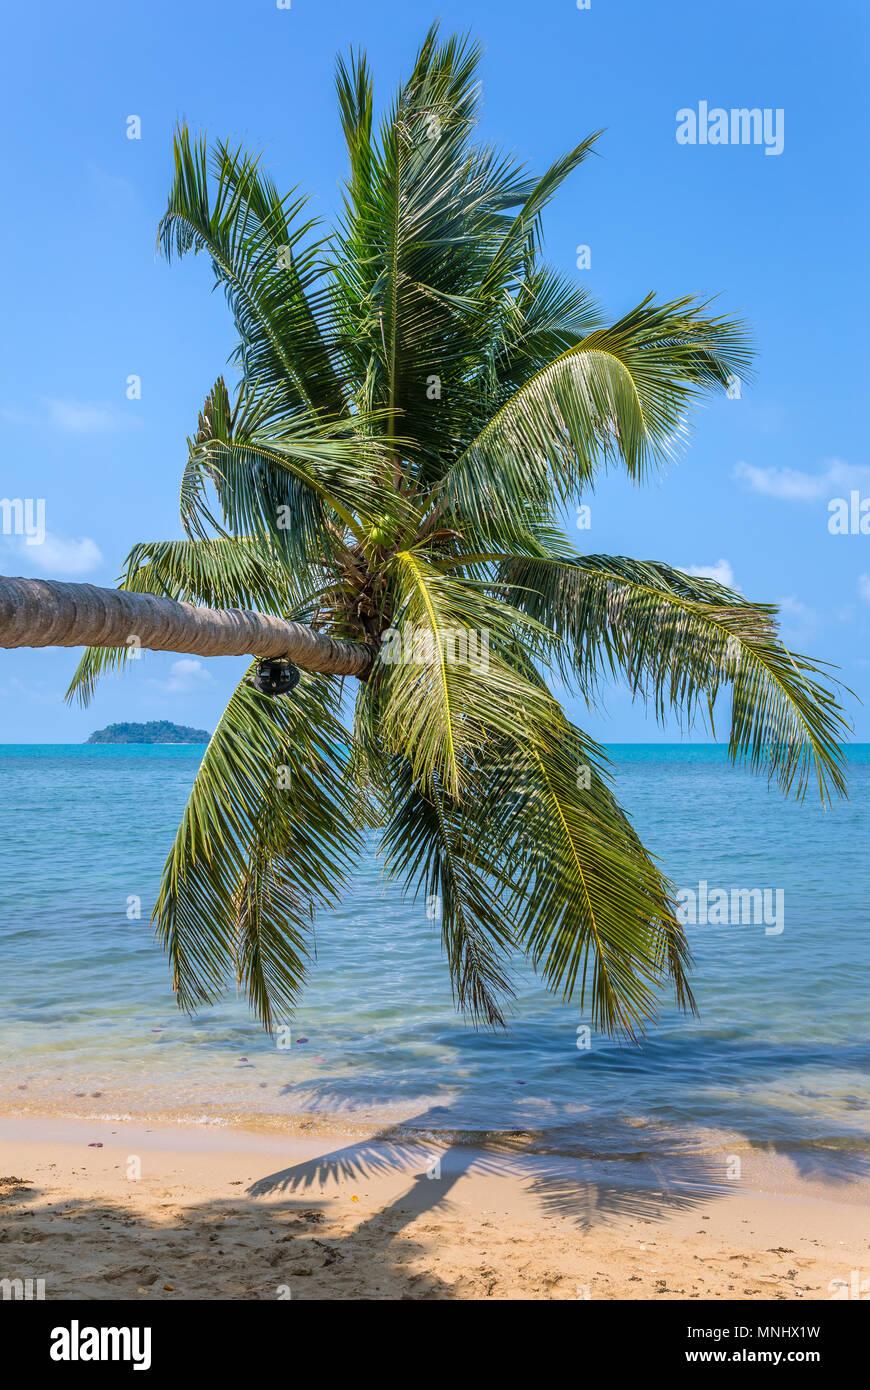 Palm Tree en la hermosa playa tropical en la isla de Koh Kood, en Tailandia Foto de stock